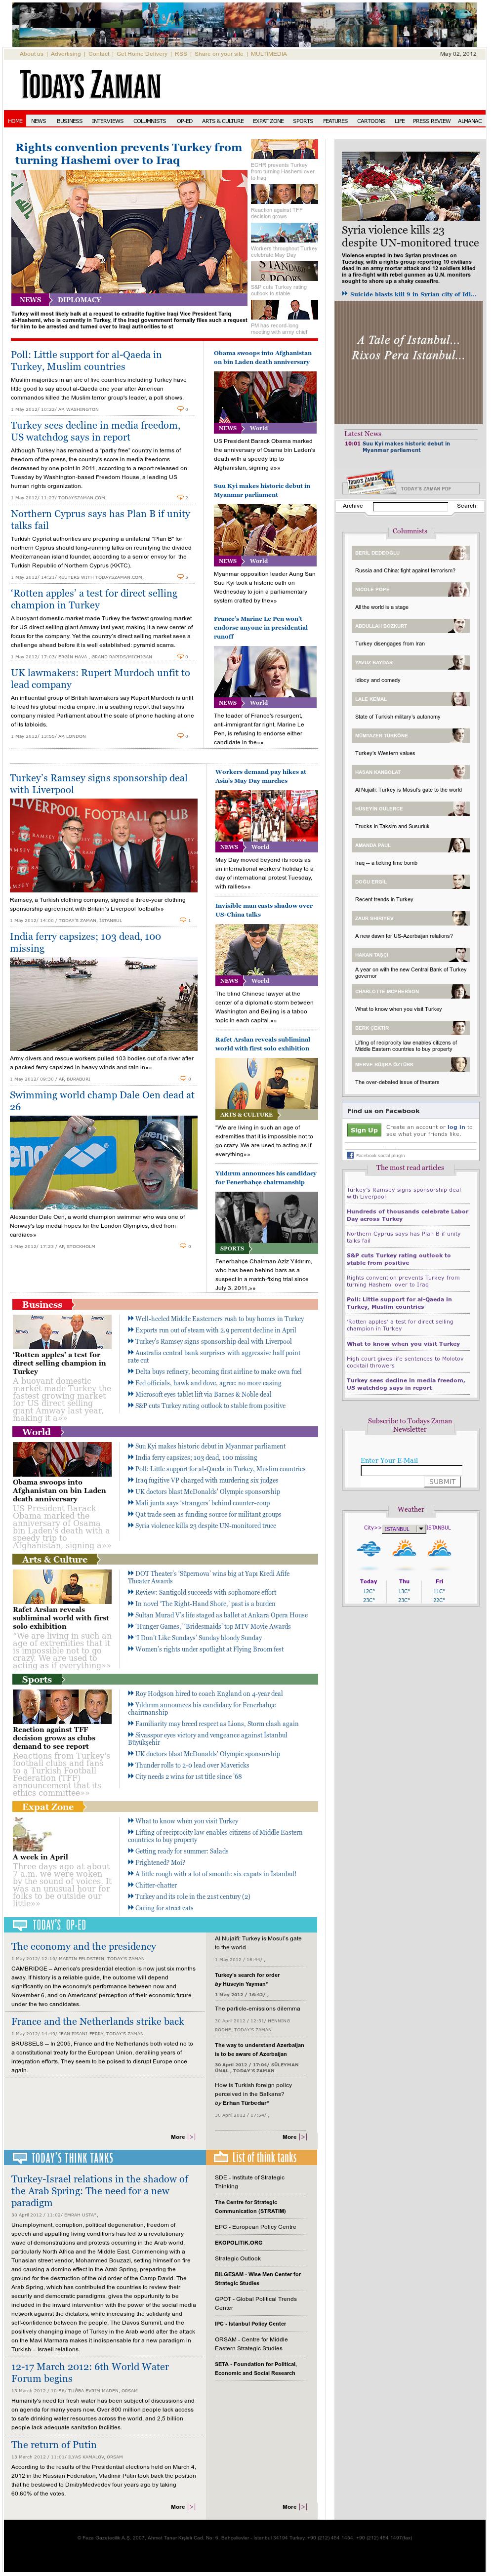 Zaman Online at Wednesday May 2, 2012, 7:21 a.m. UTC